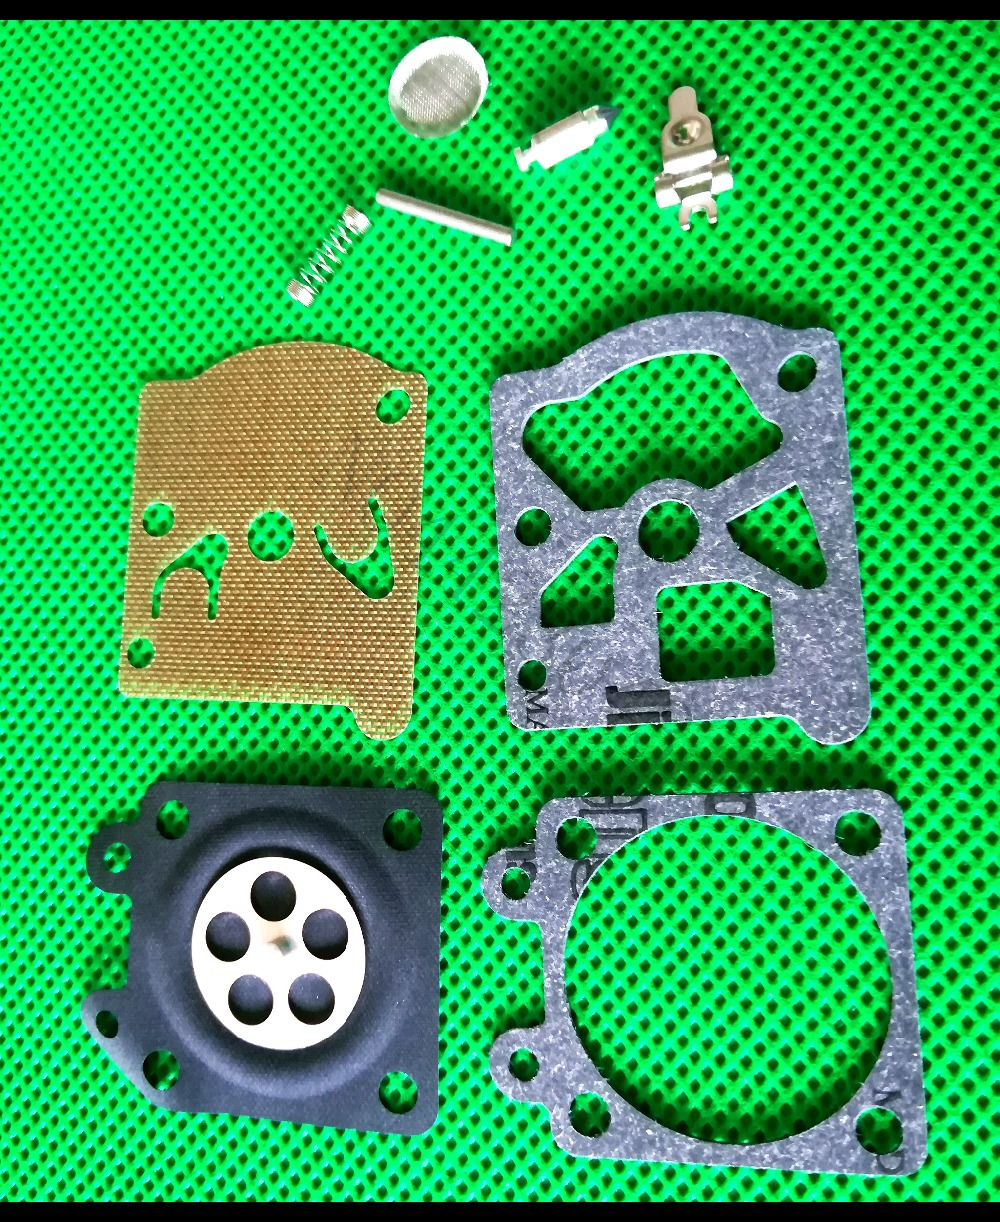 220 SETS Chainsaw 5200 5800 Carburetor Diaphragm Gasket Repair Kit w/Screw Pin for 38/45/52/58 Carb Rebuild Chainsaw Parts